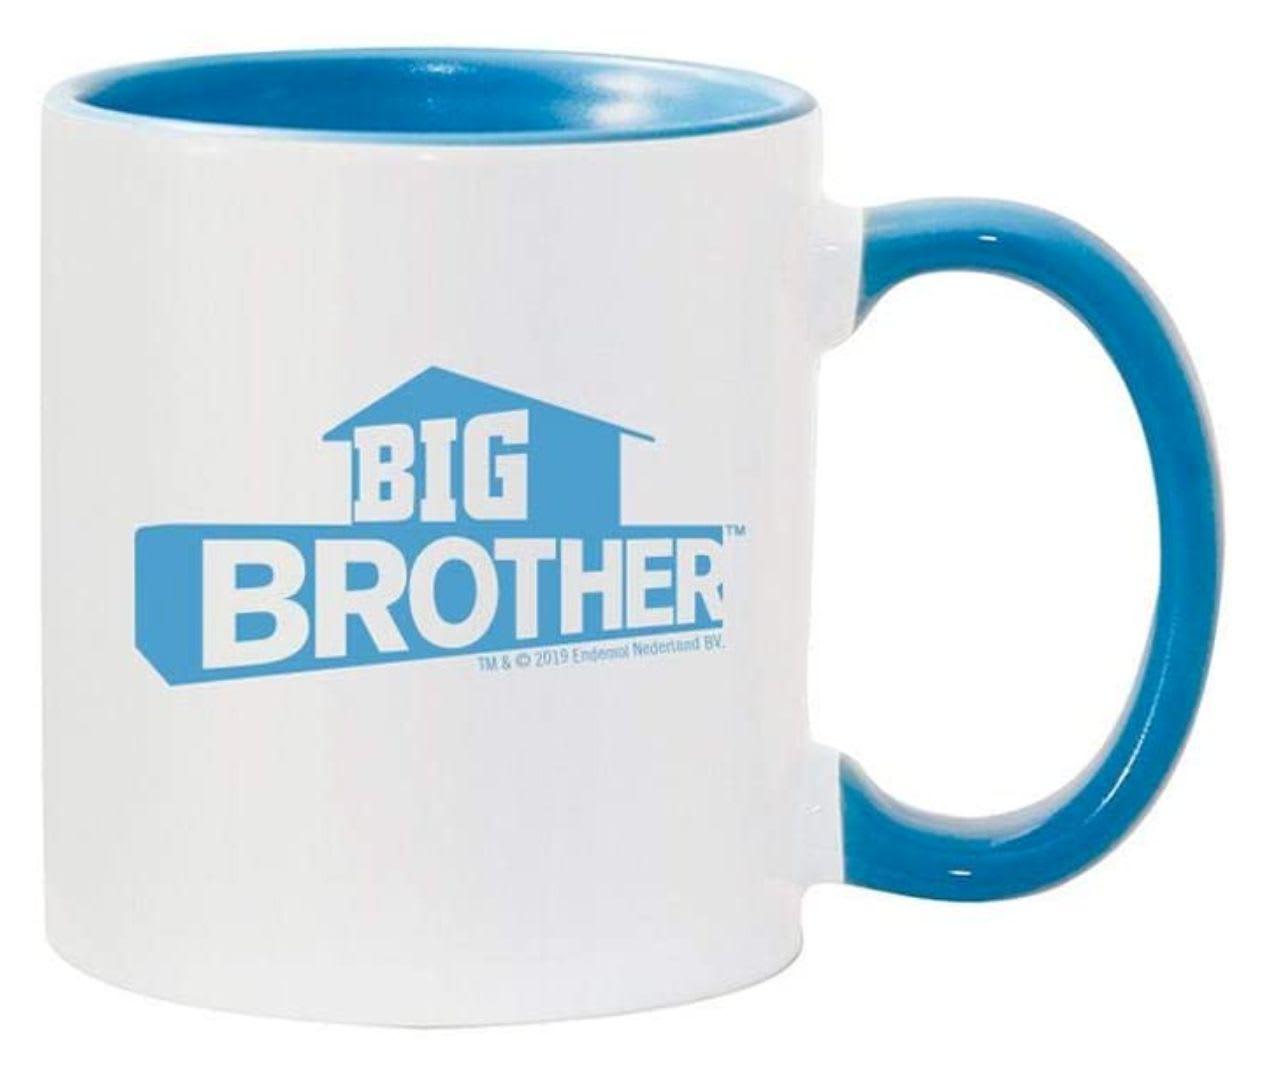 Discover CBS's logo mug available on Amazon.